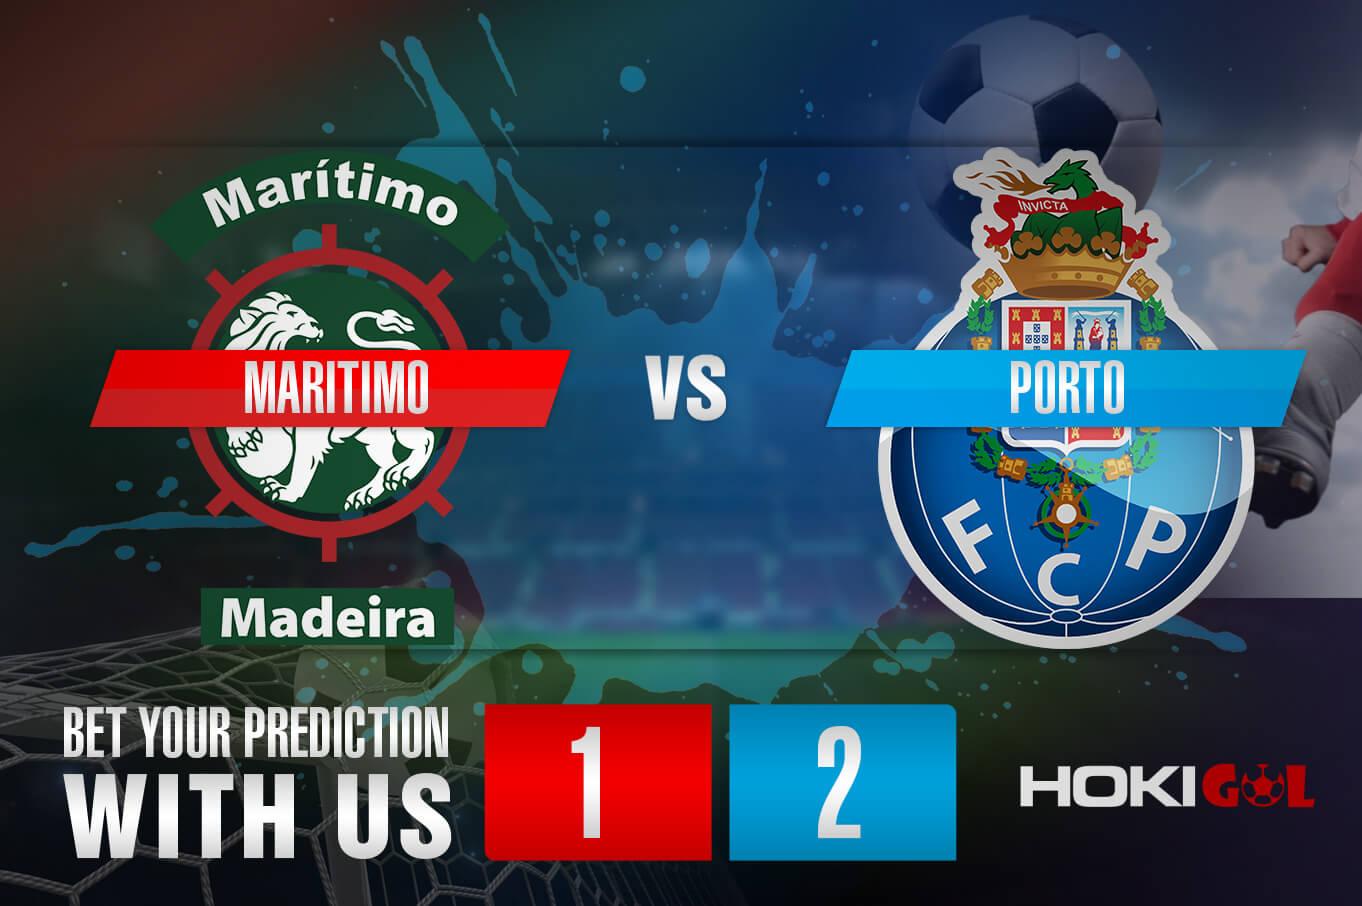 Prediksi Bola Maritimo Vs Porto 23 Februari 2021